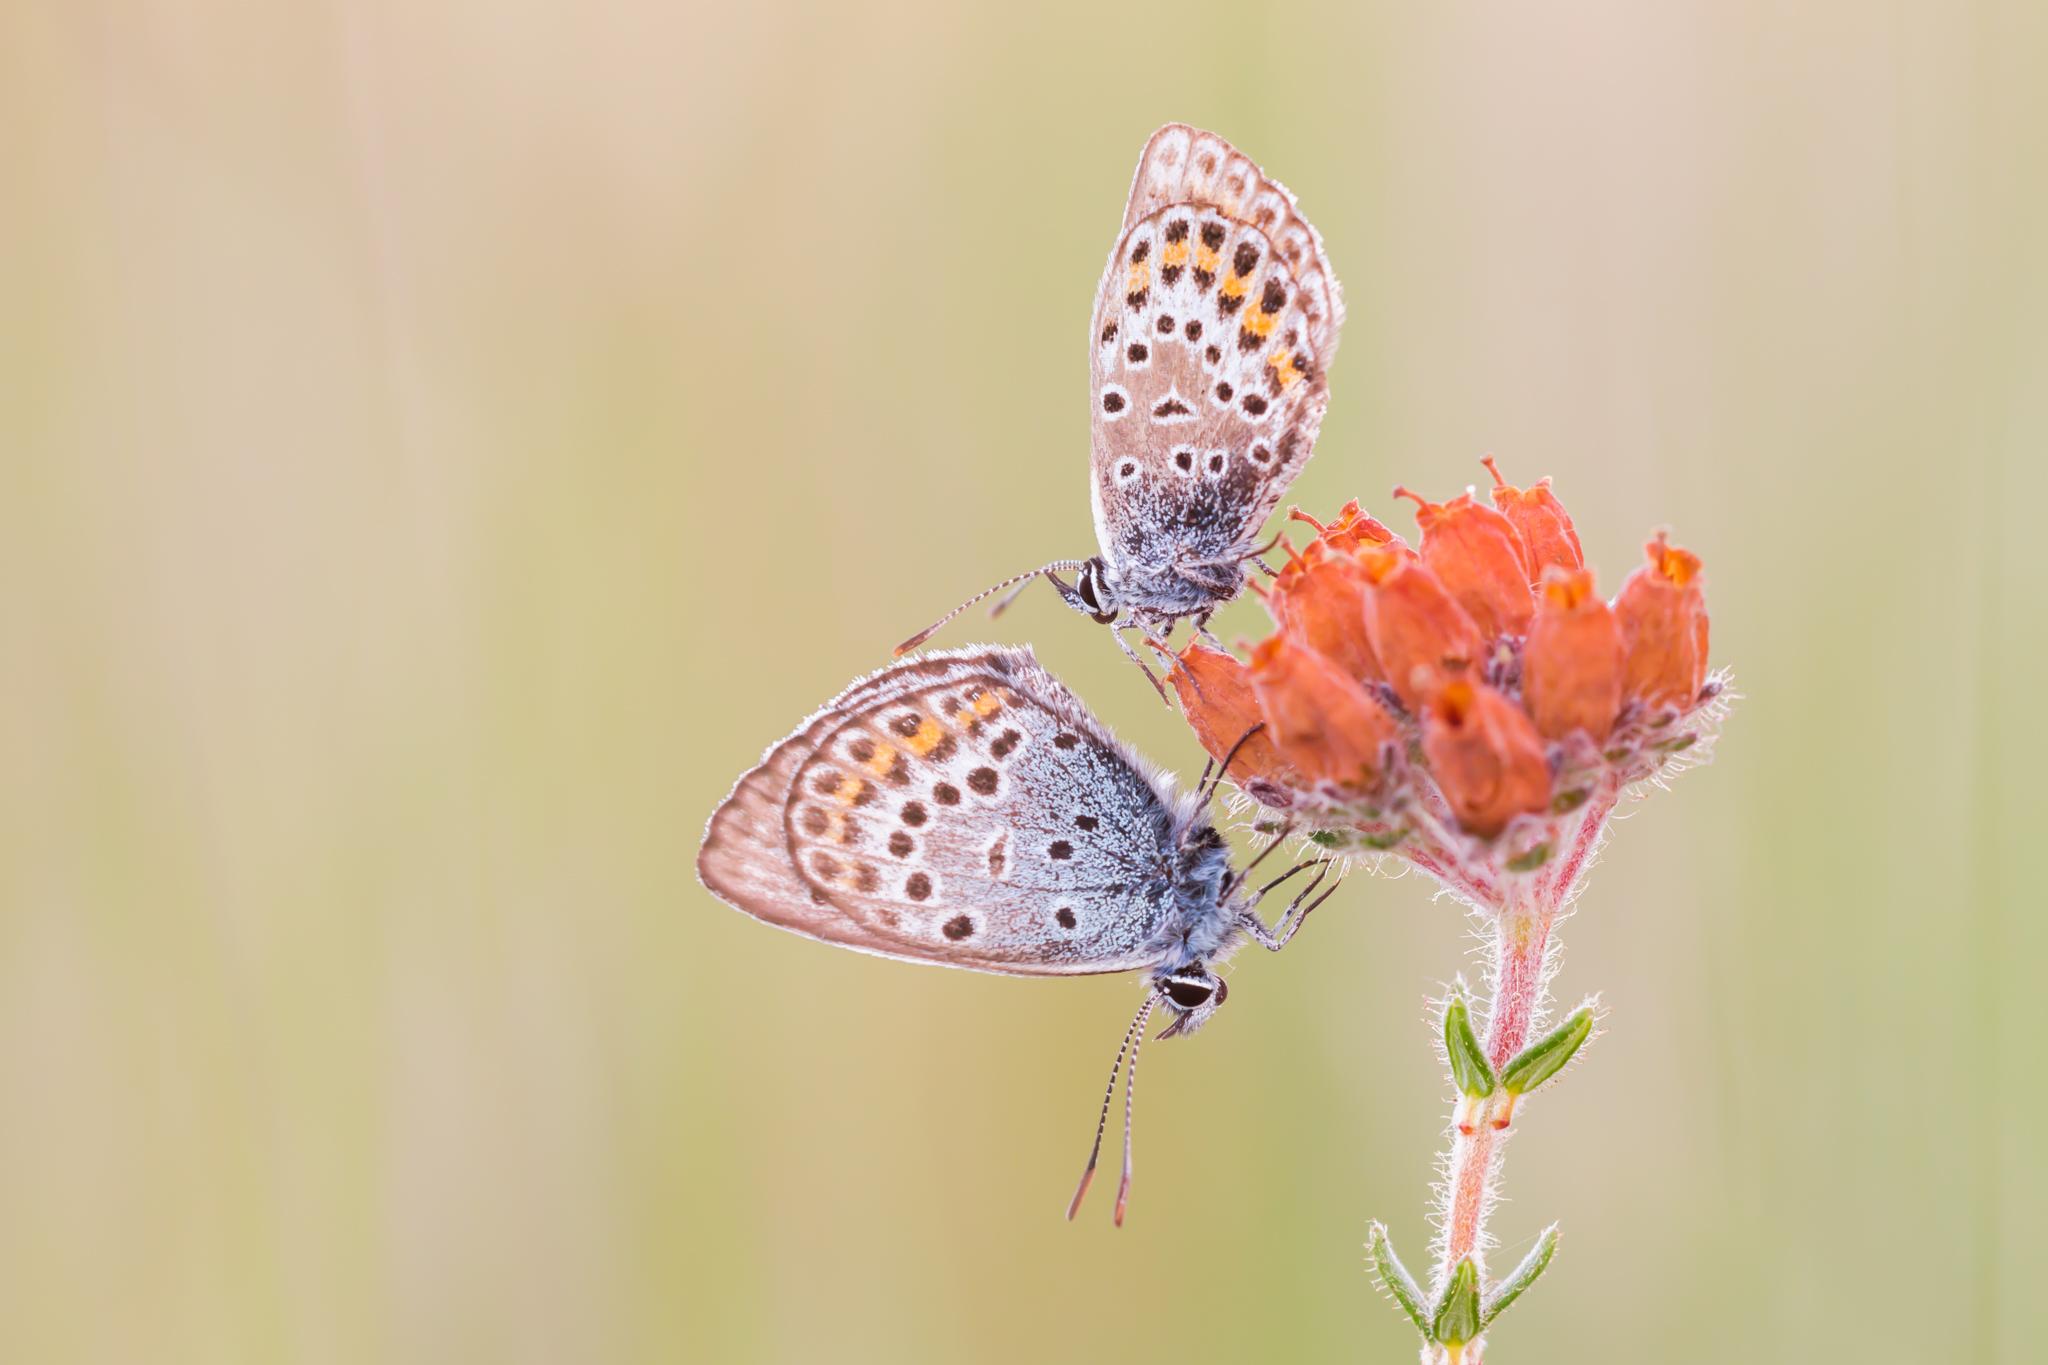 Heideblauwtje, Blauwtje, Heide, Vlinder, Vlinders, Butterflies, Butterfly, Vlinders fotograferen, Vlinderfotografie, Insect, Insecten, Deknatel, Leo Deknatel, Deknatelfotografie